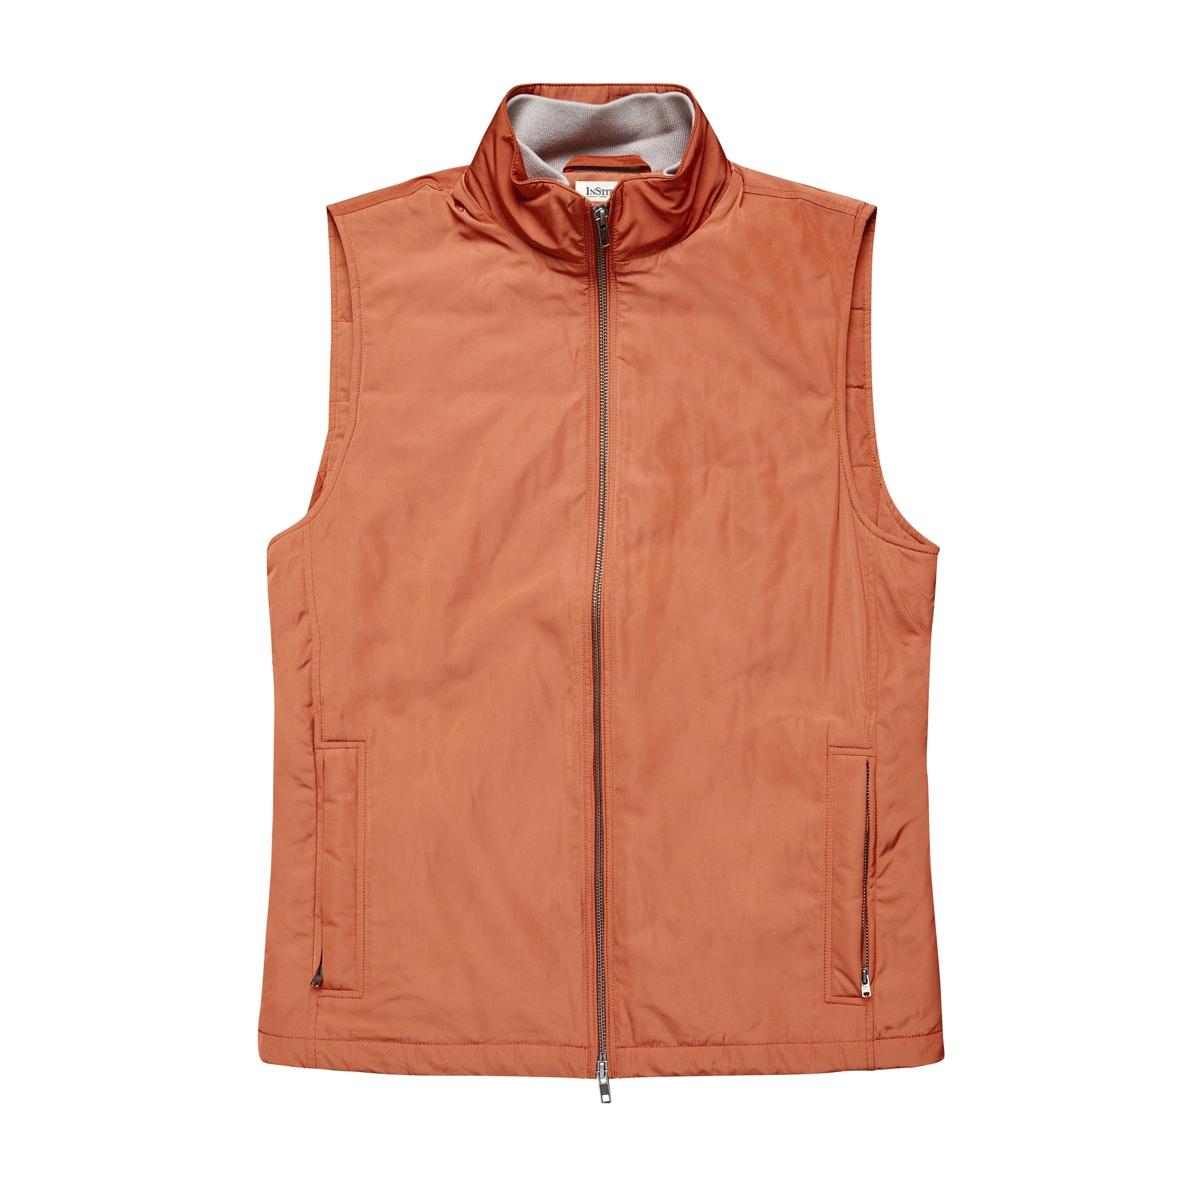 The Pemberton Clay Vest